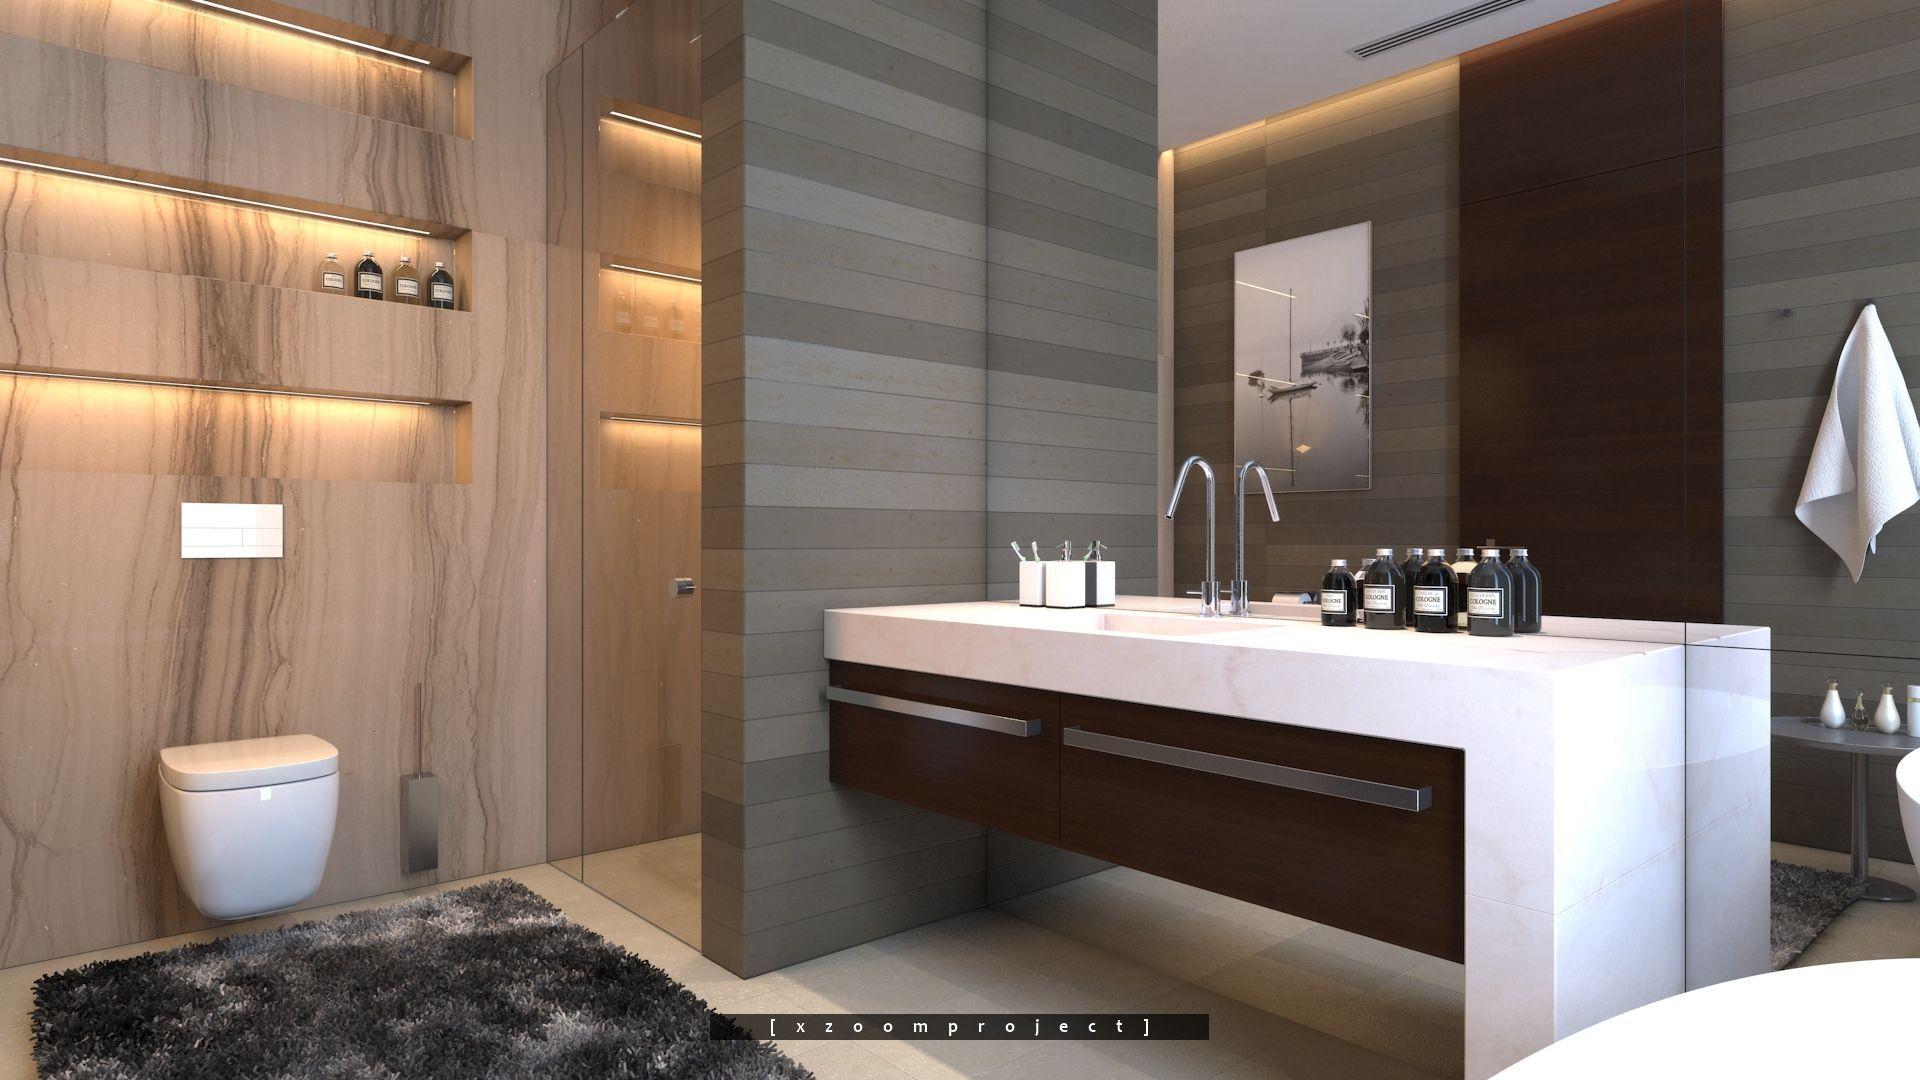 Luxury Villa Interior. Saudi Arabia. Bathroom. # ...